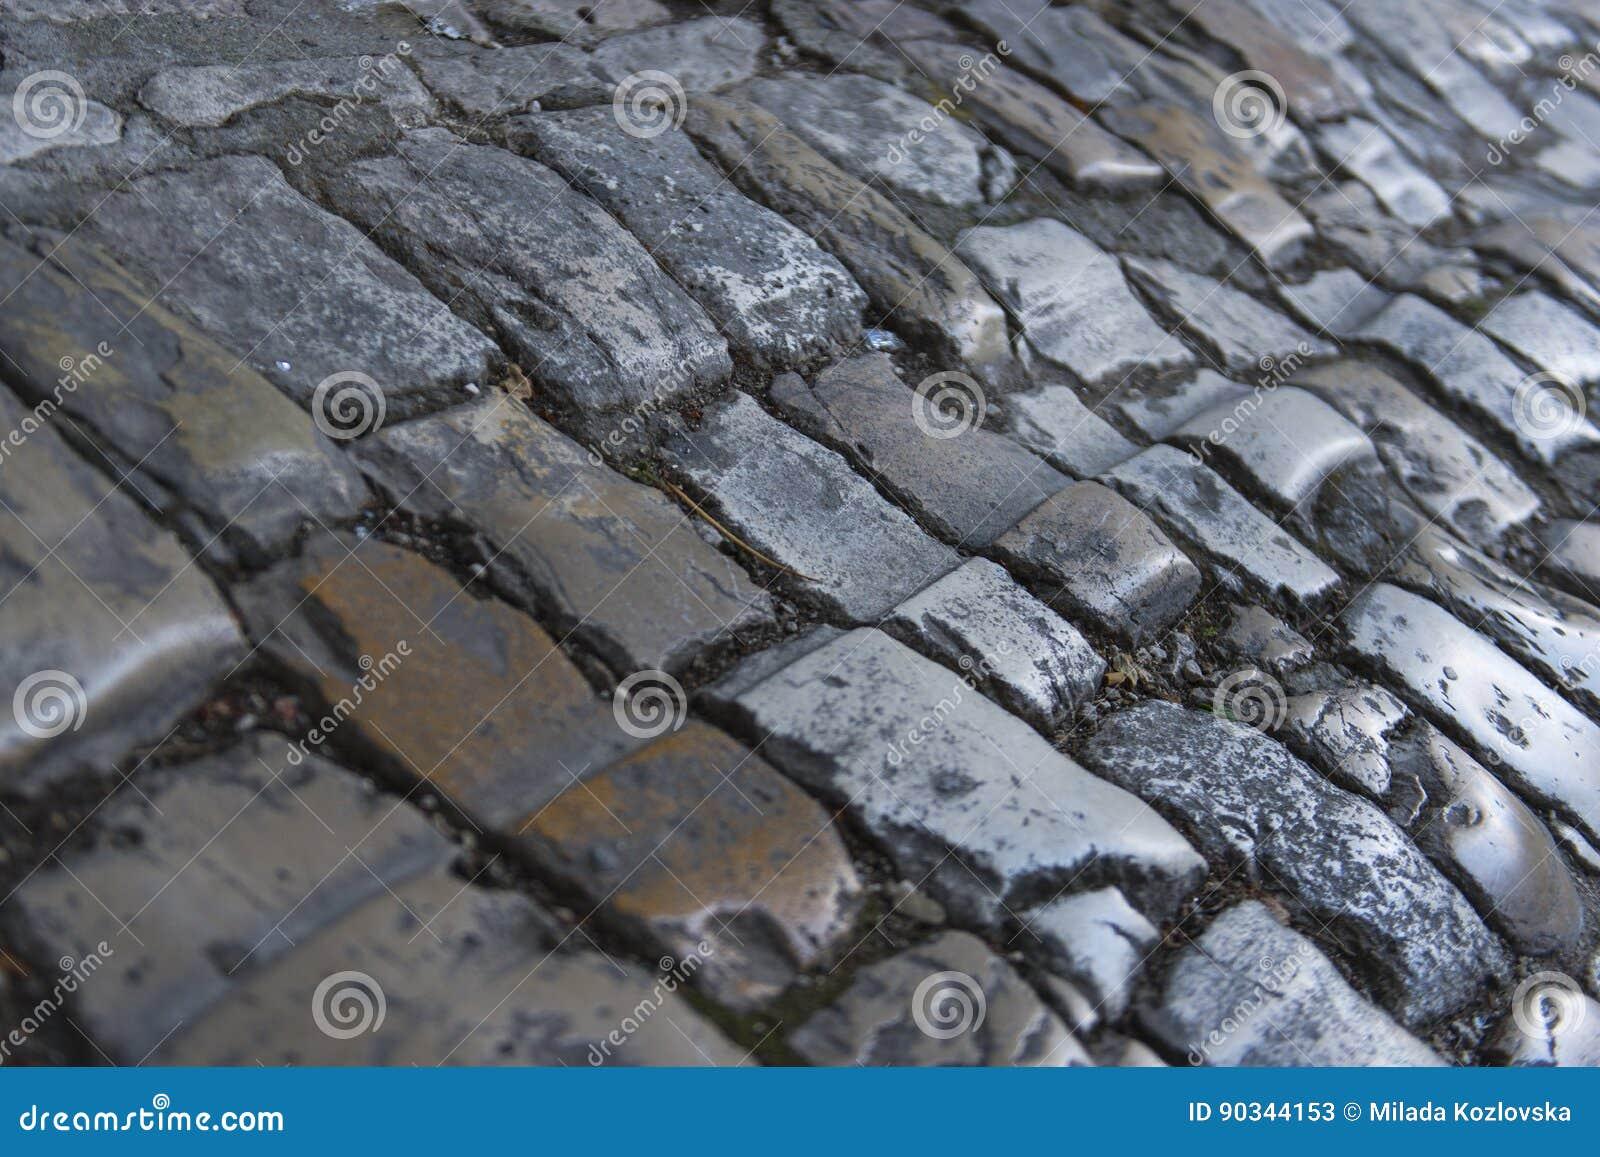 Detail van middeleeuwse steenbestrating in Trogir, Unesco-stad, Kroatië